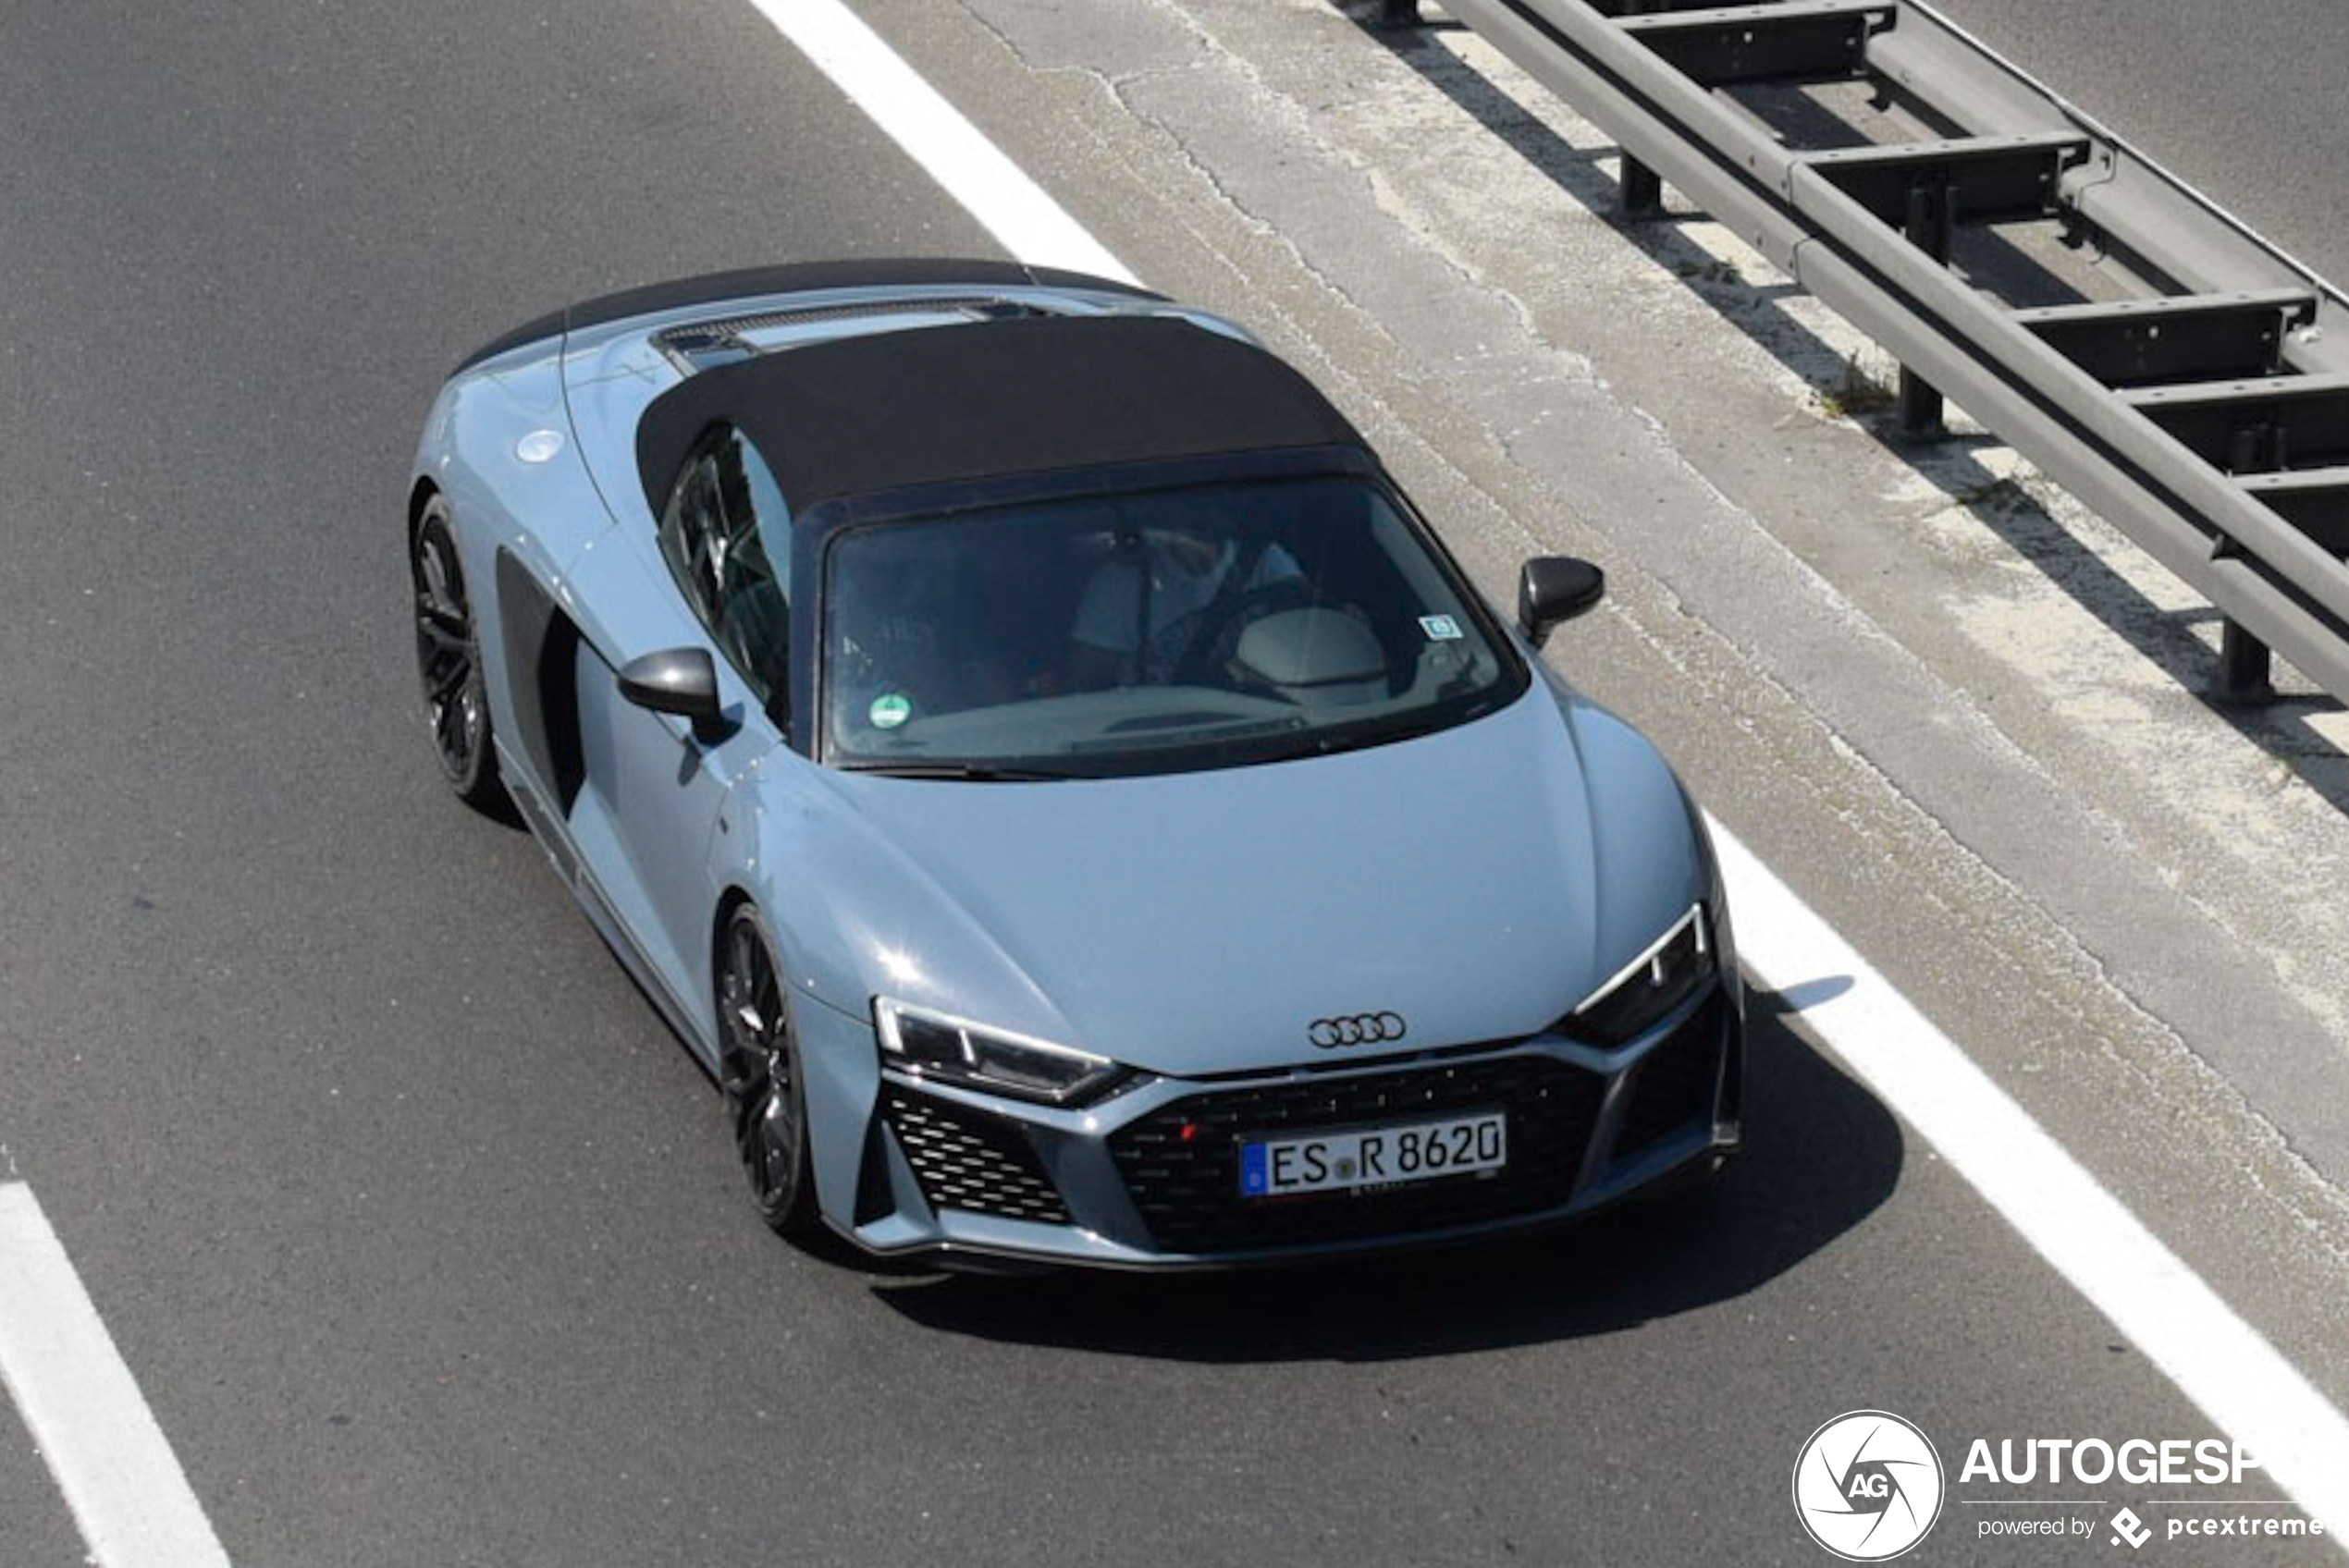 AudiR8 V10 Spyder 2019